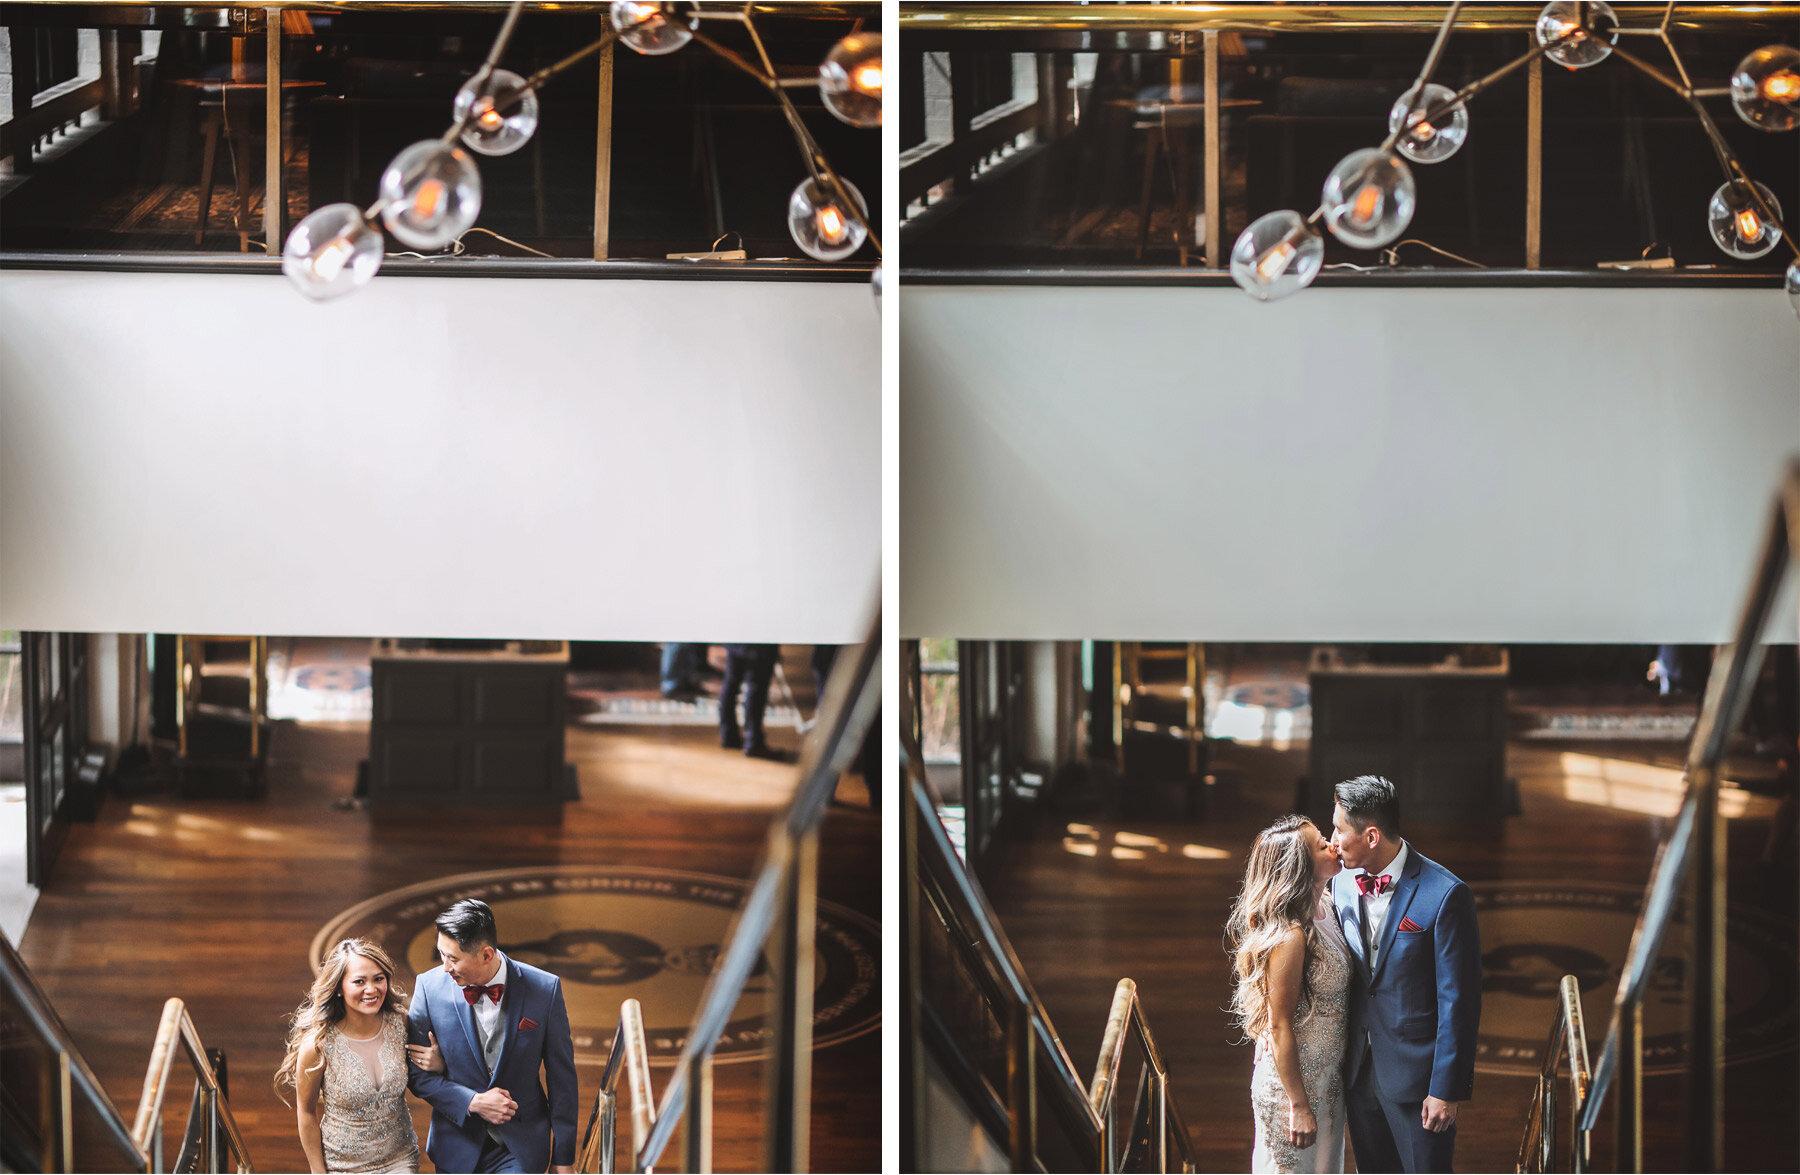 04-Vick-Photography-Minneapolis-Minnesota-The-Graduate-Lobby-Hotel-Bride-Groom-First-Look-Mai-&-Ross.jpg